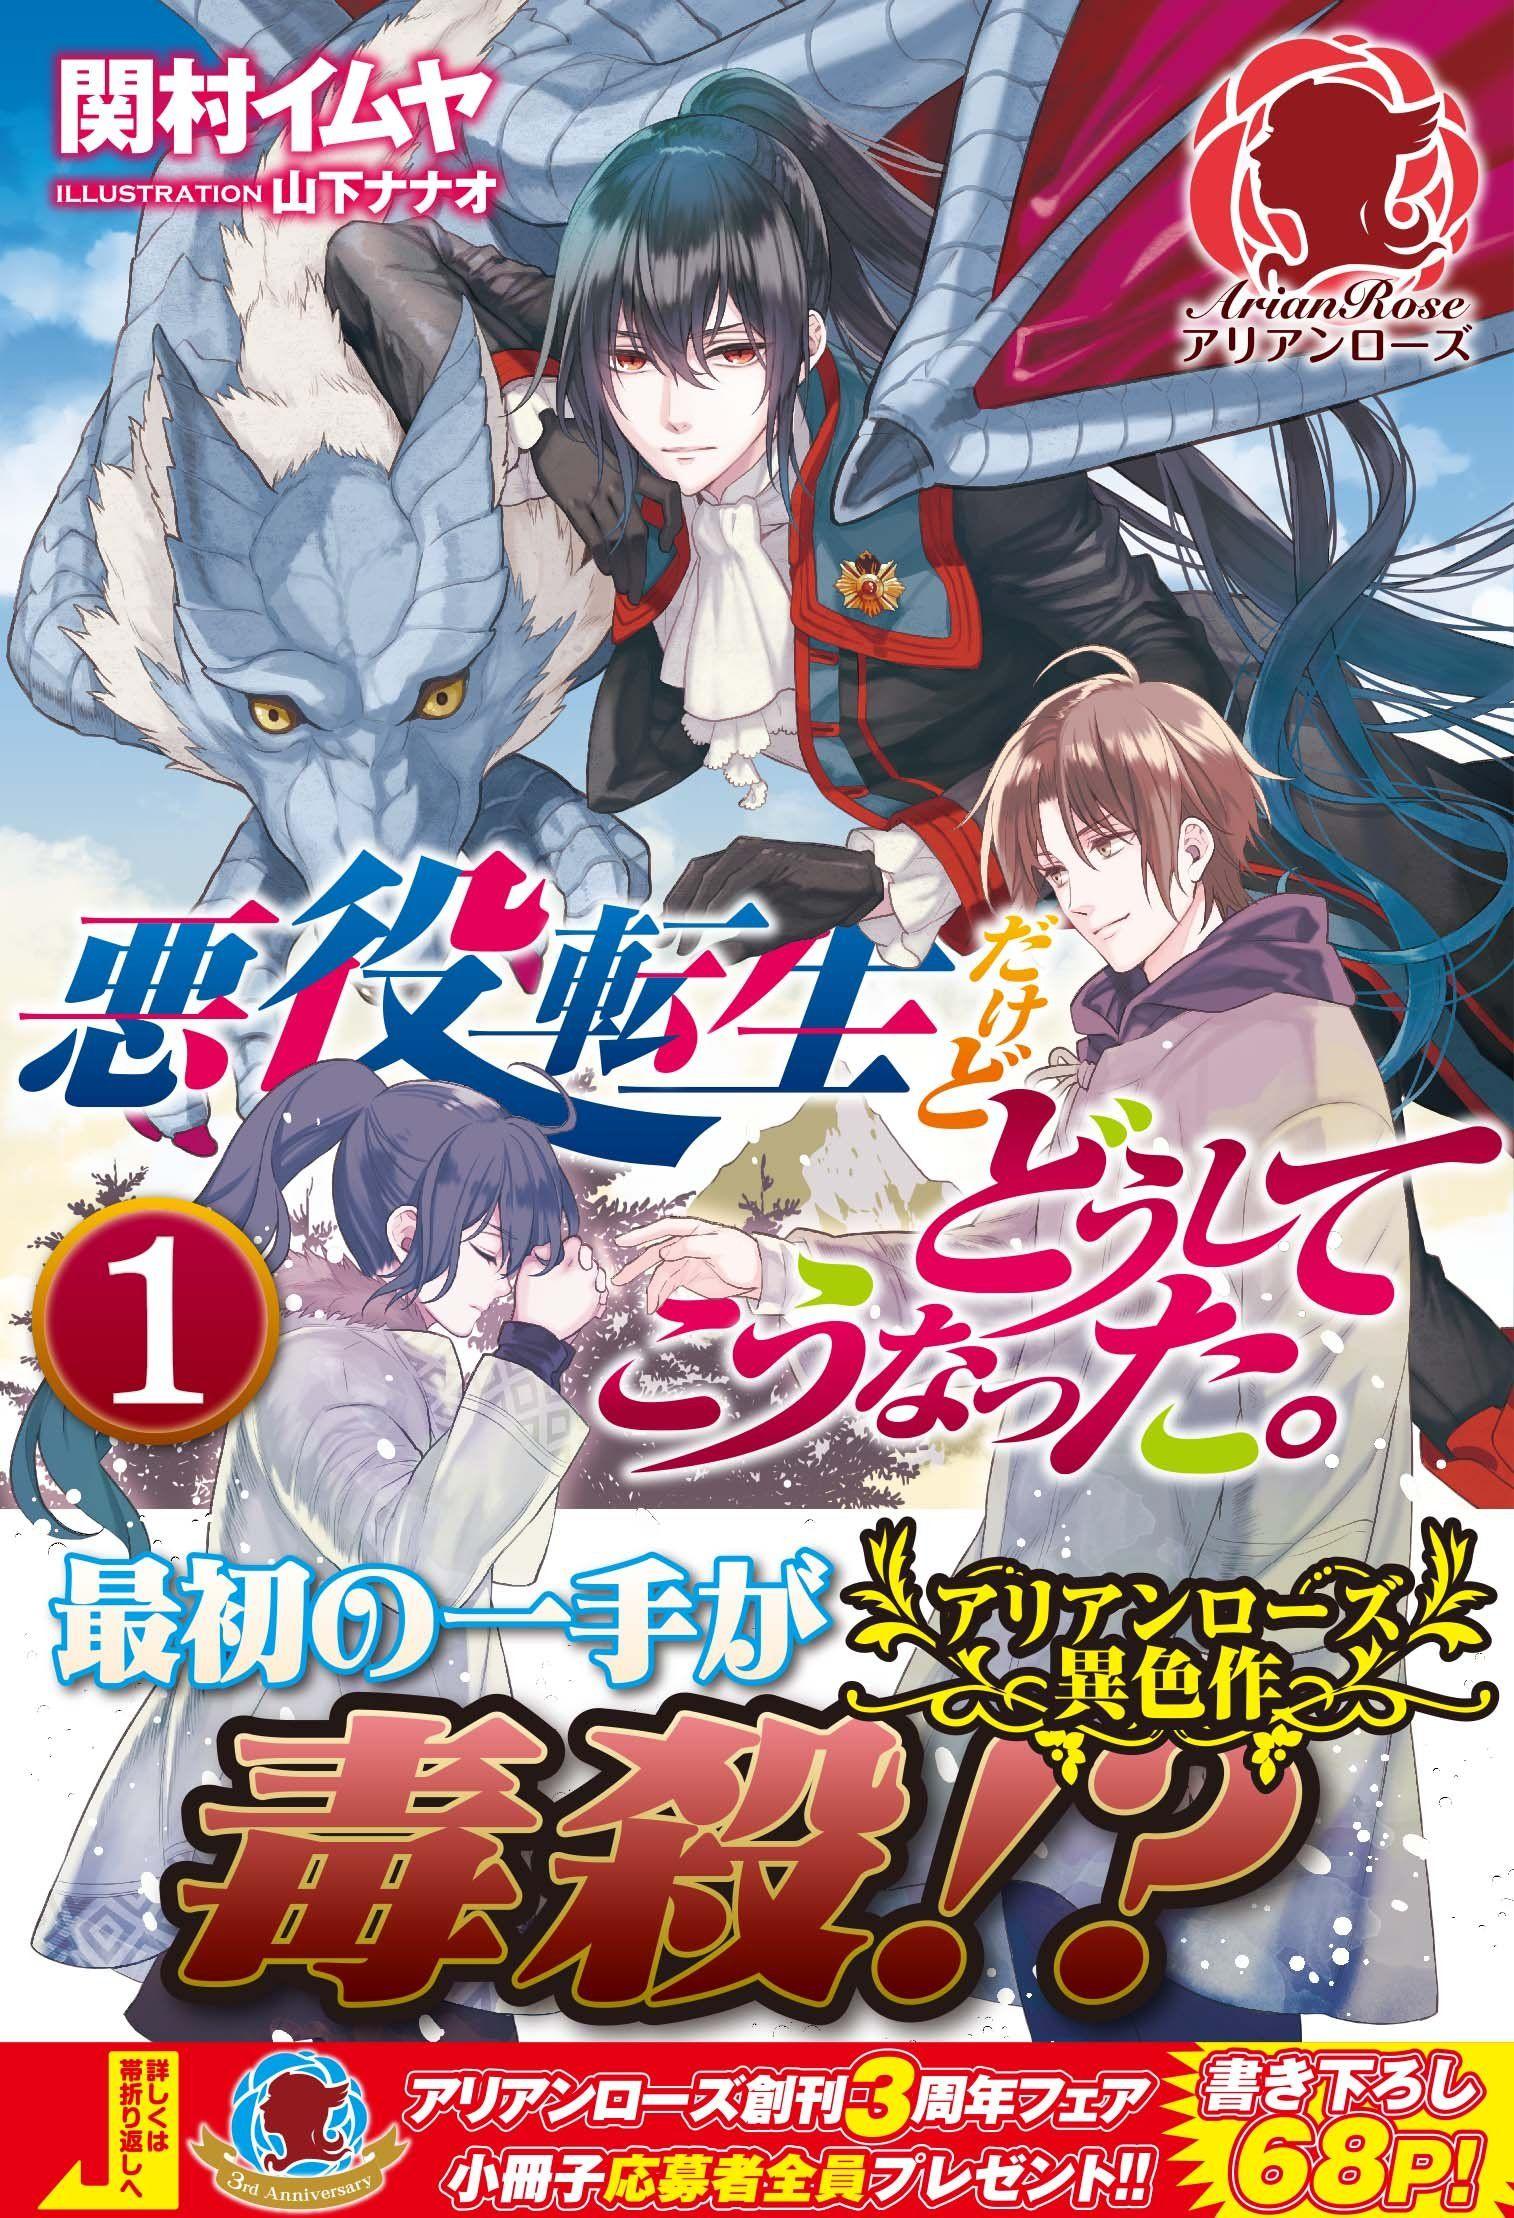 Akuyaku Tensei Dakedo Doushite Kou Natta | Manga covers. Light novel. Manga romance